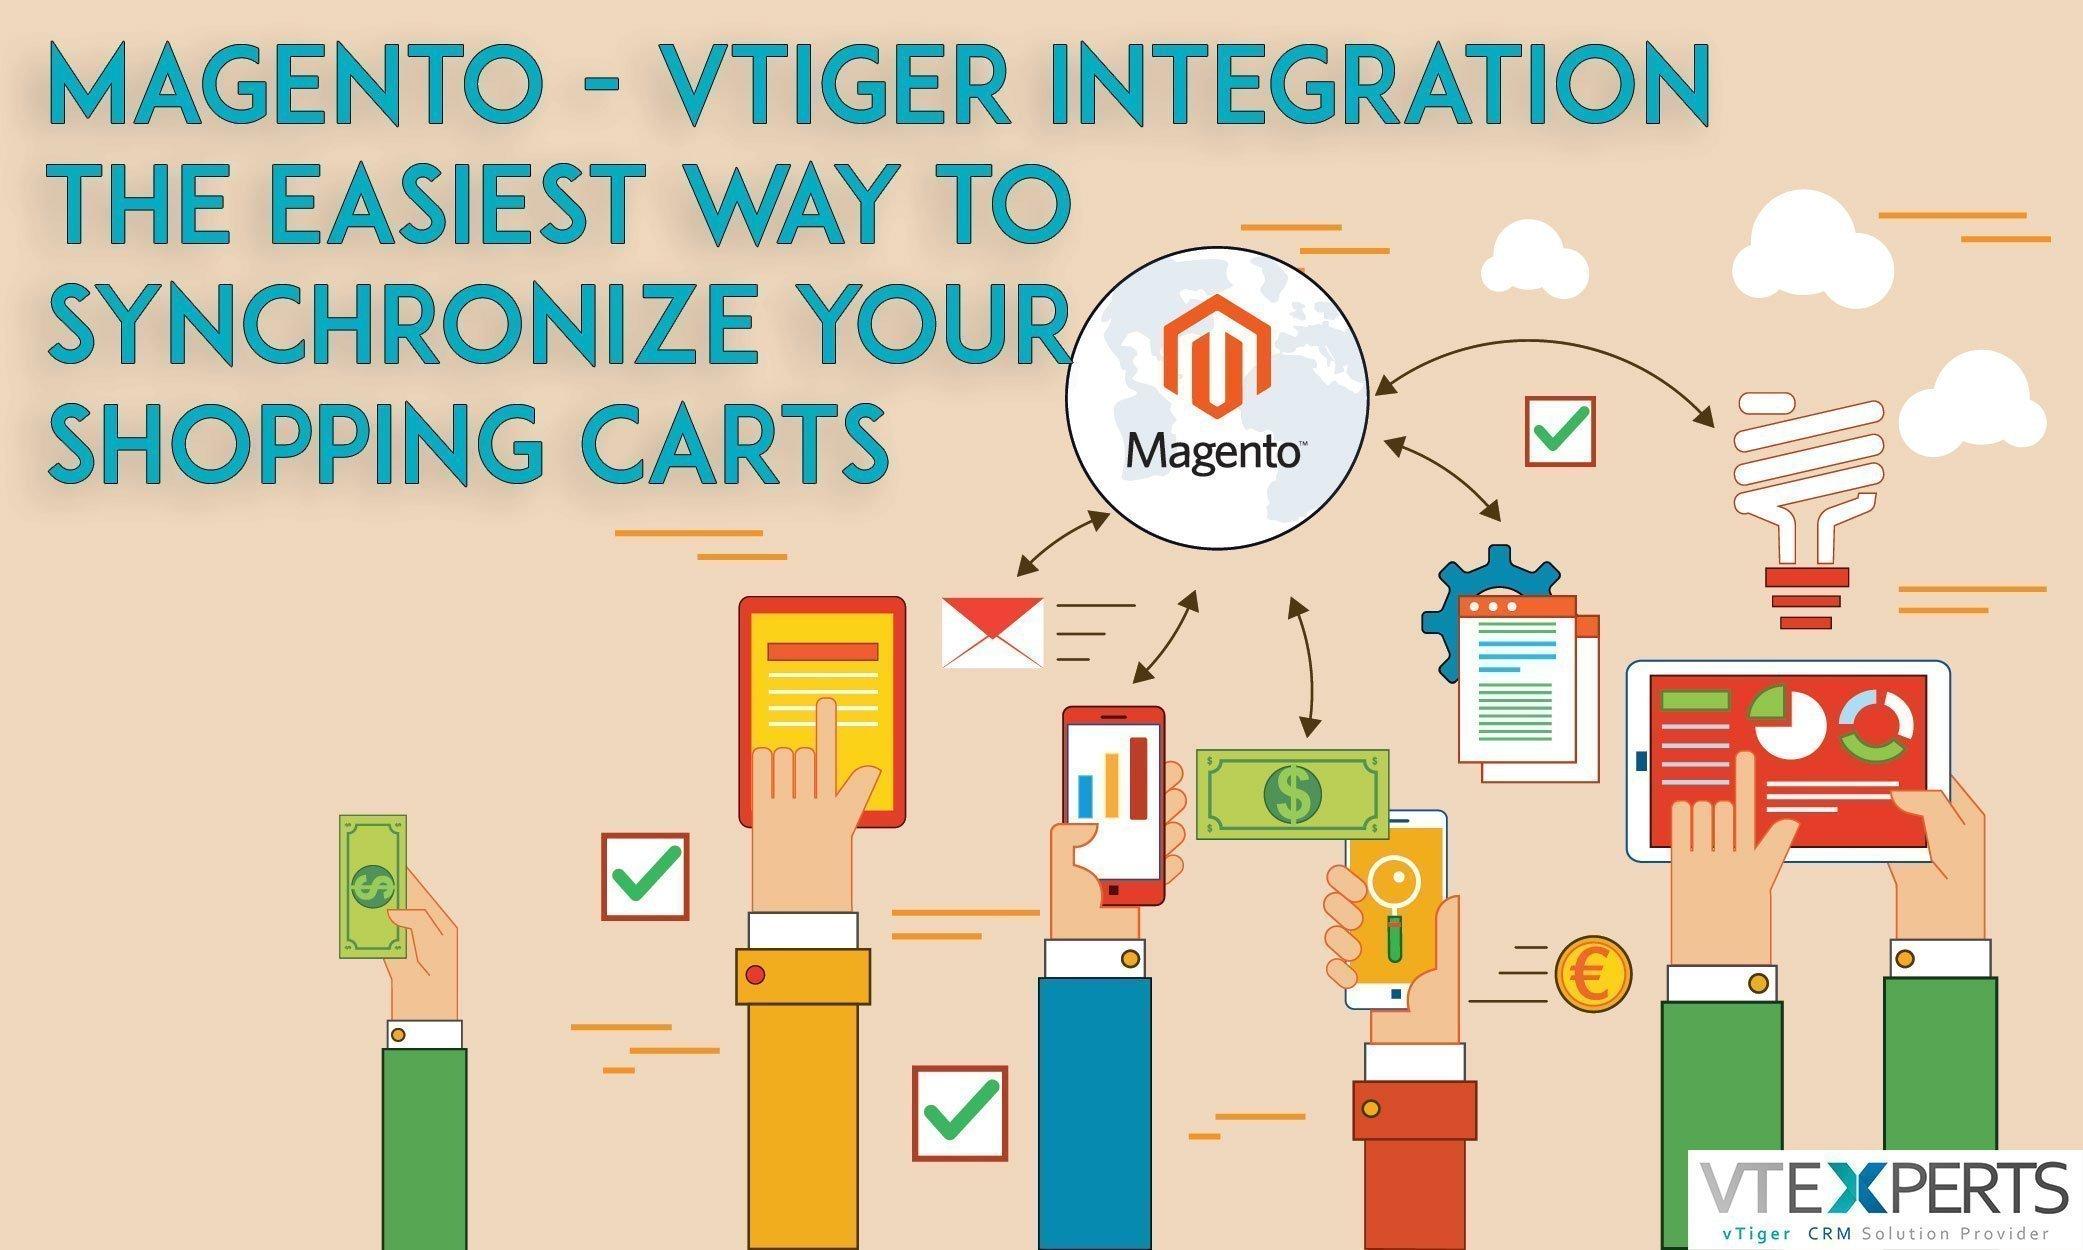 Synchronize Magento Shopping Carts With VTiger - VTiger Experts